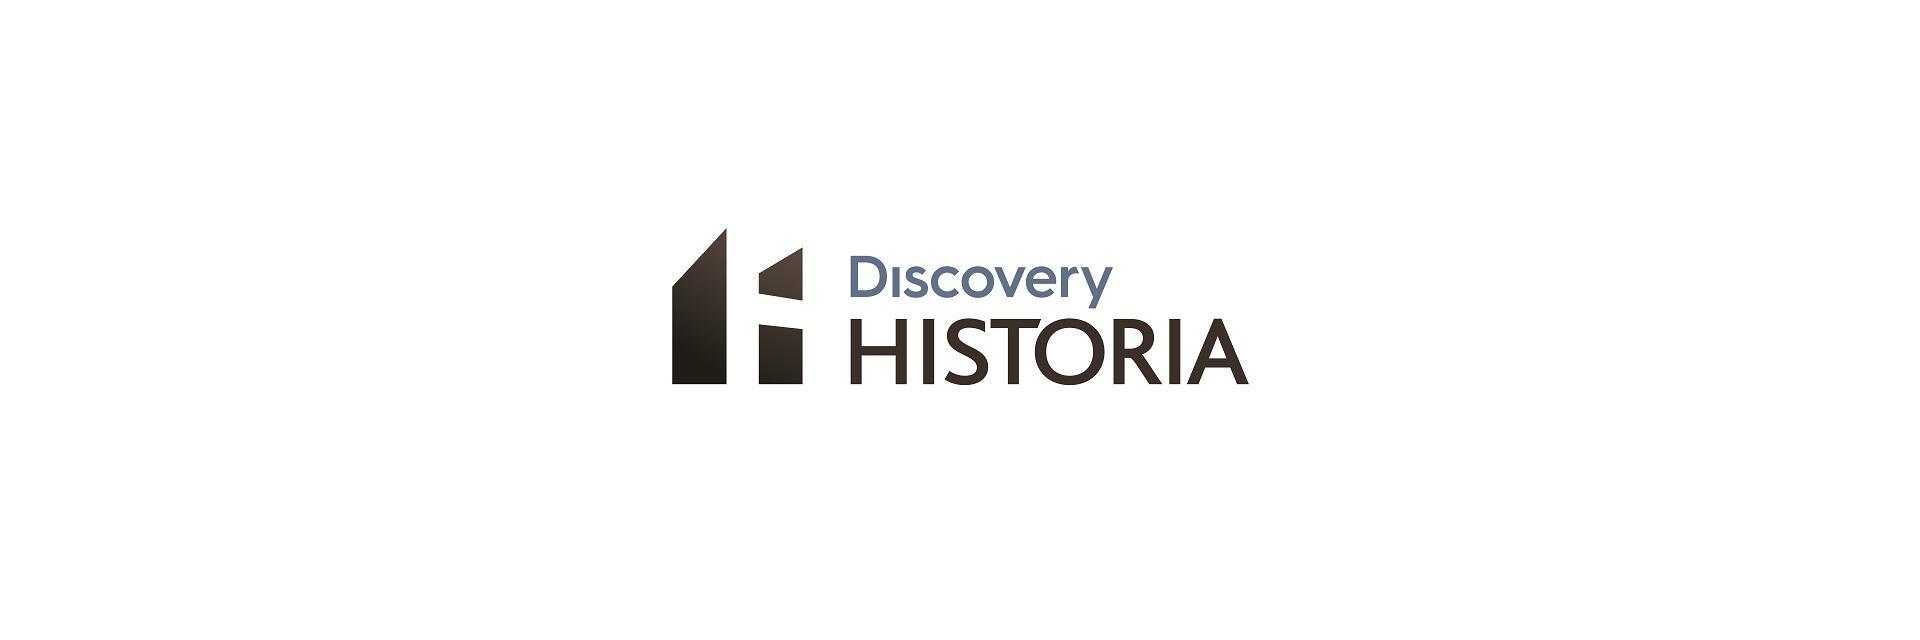 Ramówka Discovery Historia